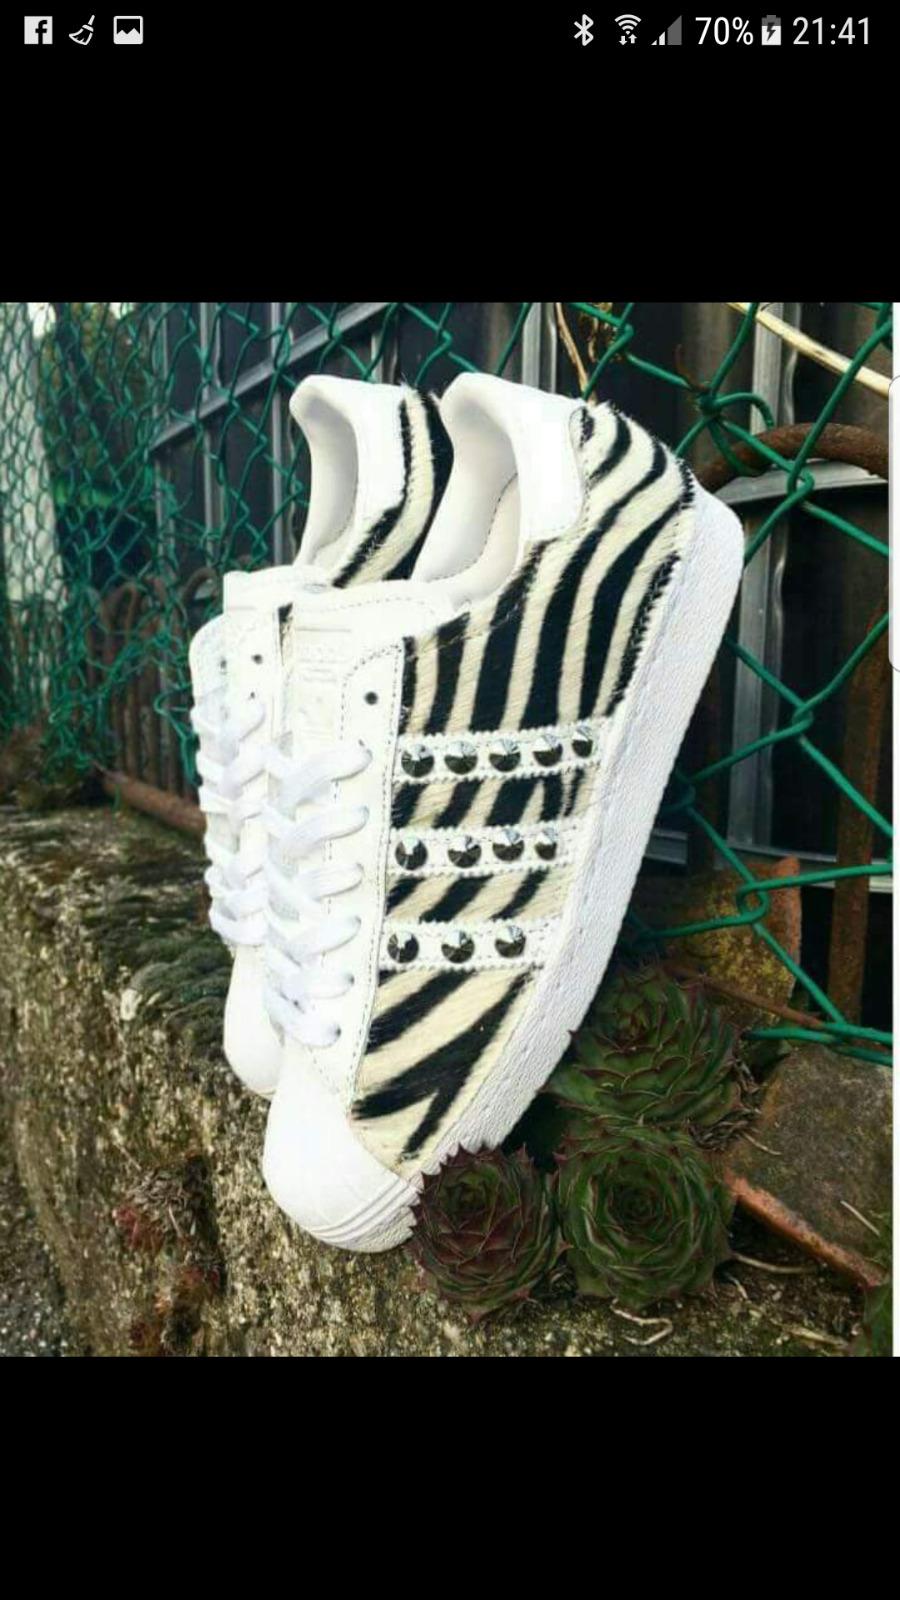 Casual salvaje Barato y cómodo scarpe adidas superstar con  cavallino zebrato e borchie